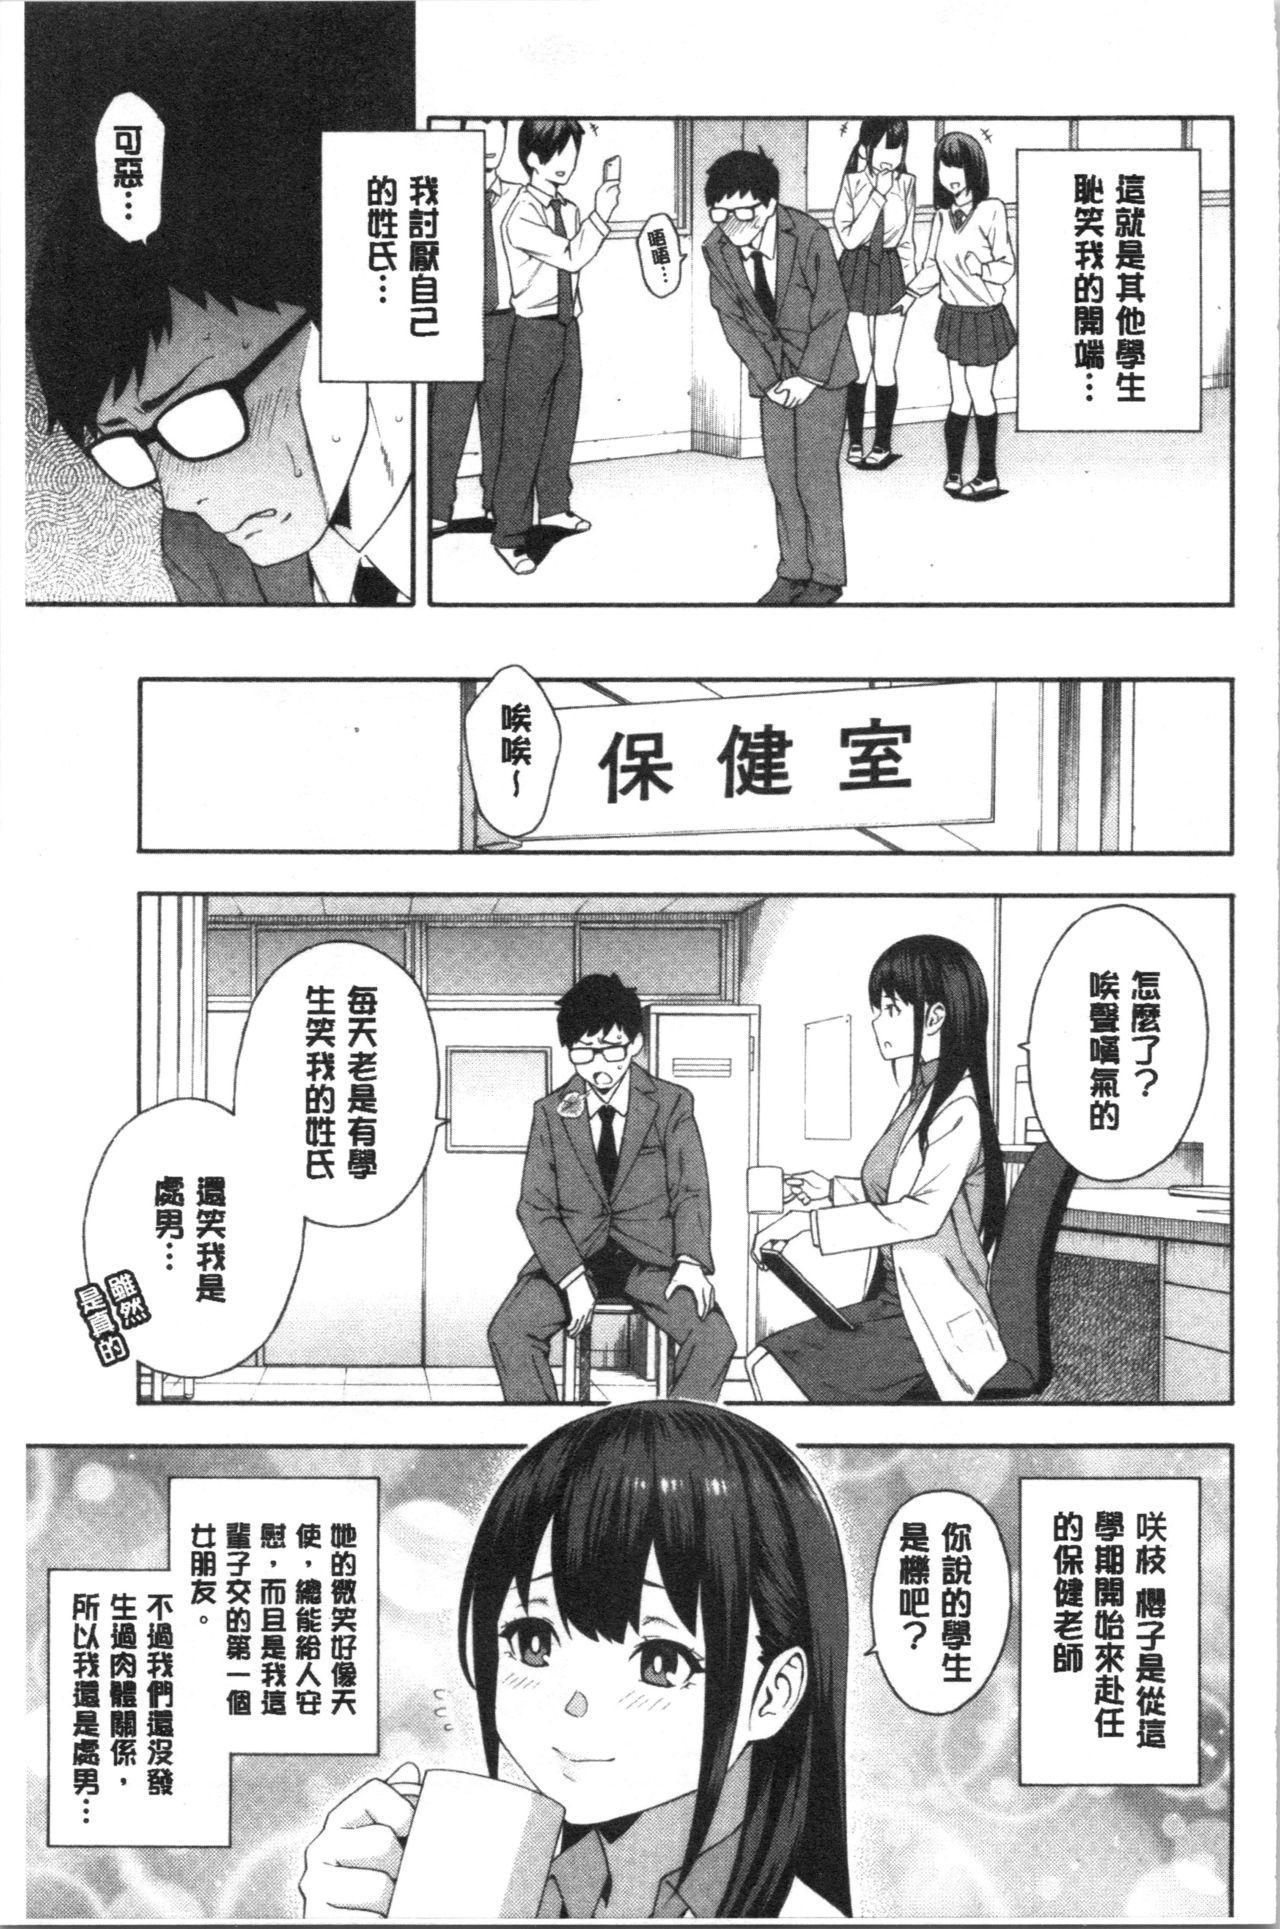 Okashite Ageru | 讓你來侵犯我 7